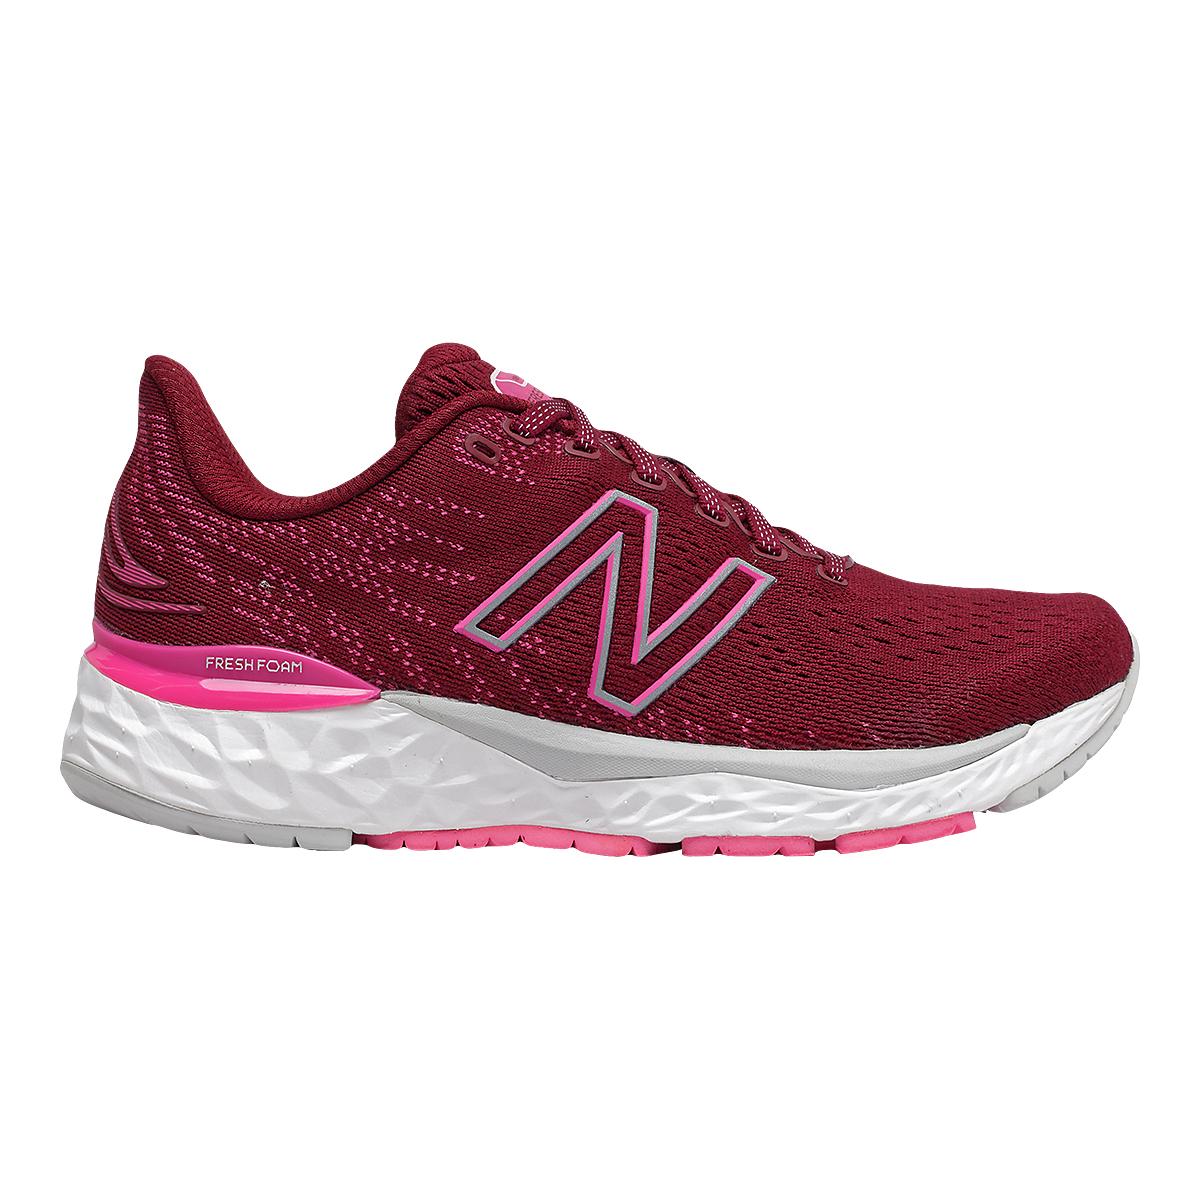 Women's New Balance 880V11 Running Shoe - Color: Garnet/Pink Glo - Size: 5 - Width: Narrow, Garnet/Pink Glo, large, image 1